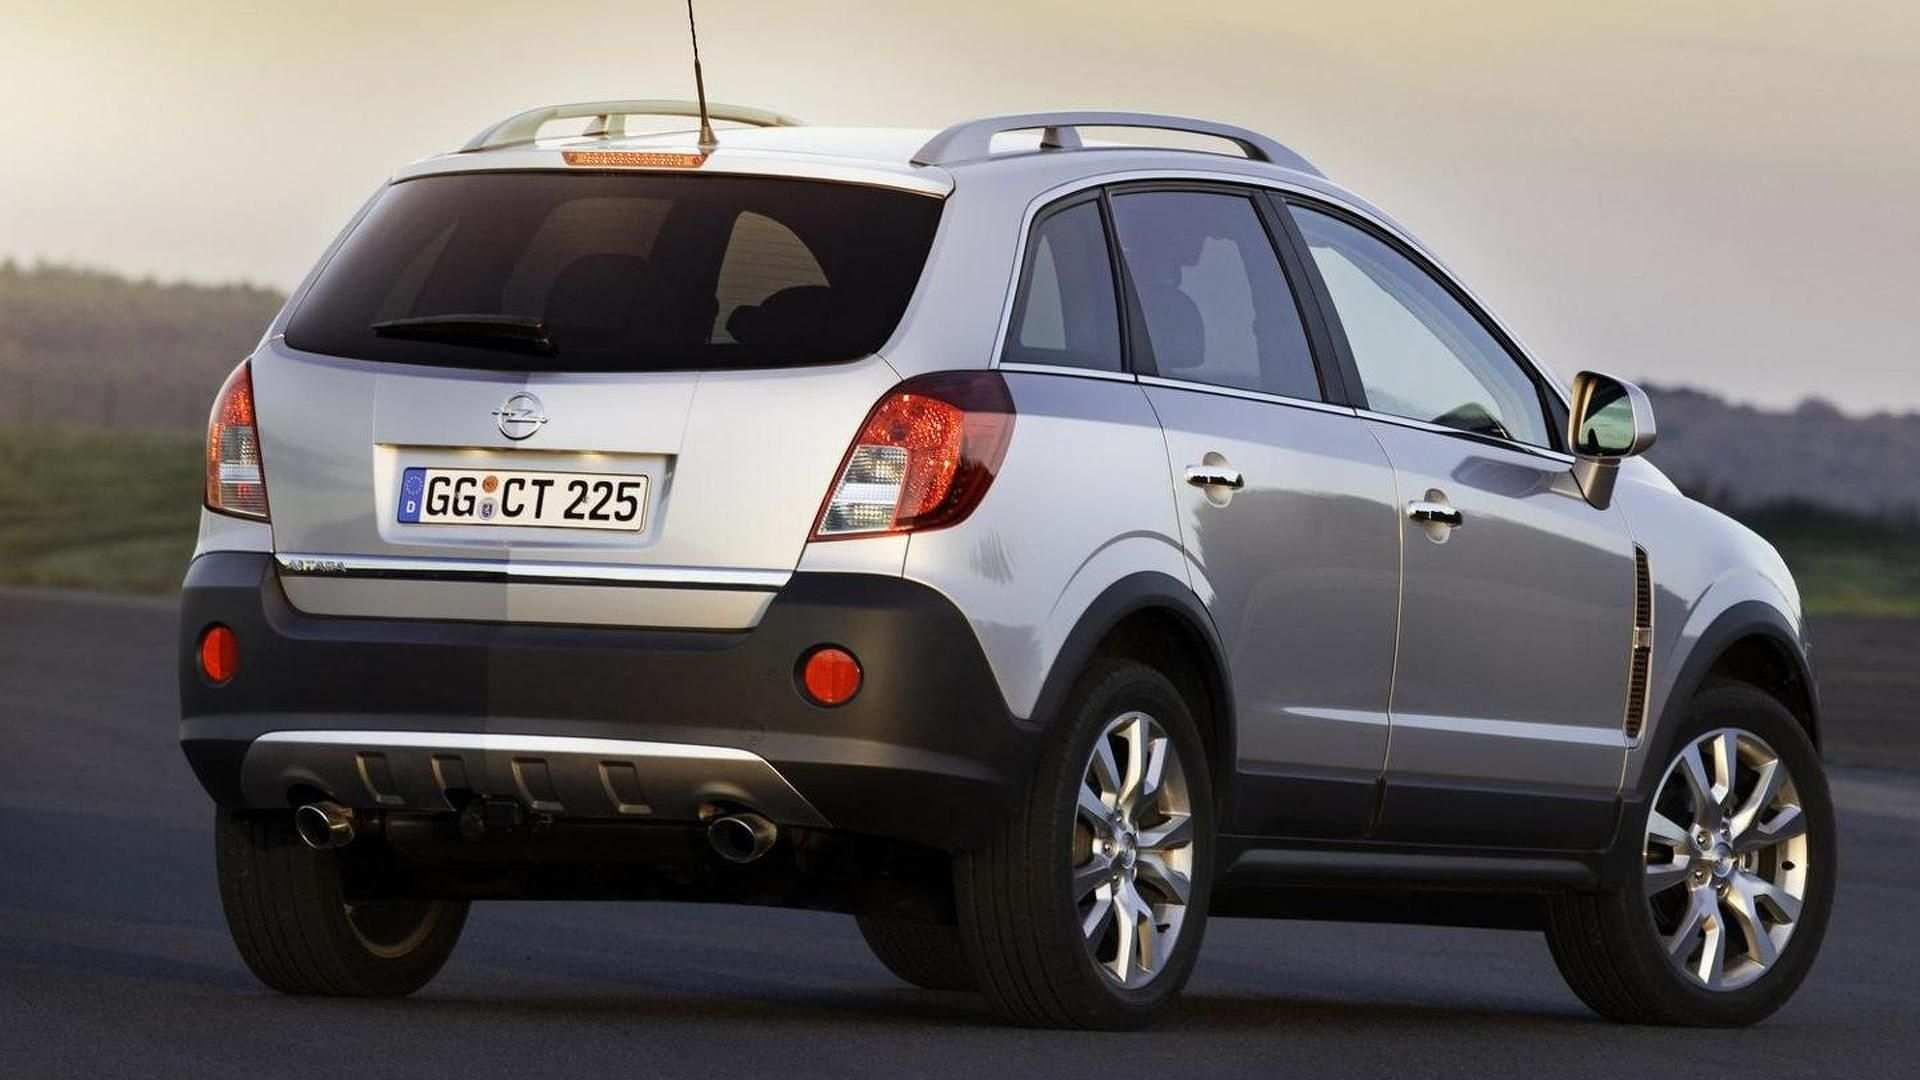 63 All New 2020 Opel Antara 2020 Configurations by 2020 Opel Antara 2020